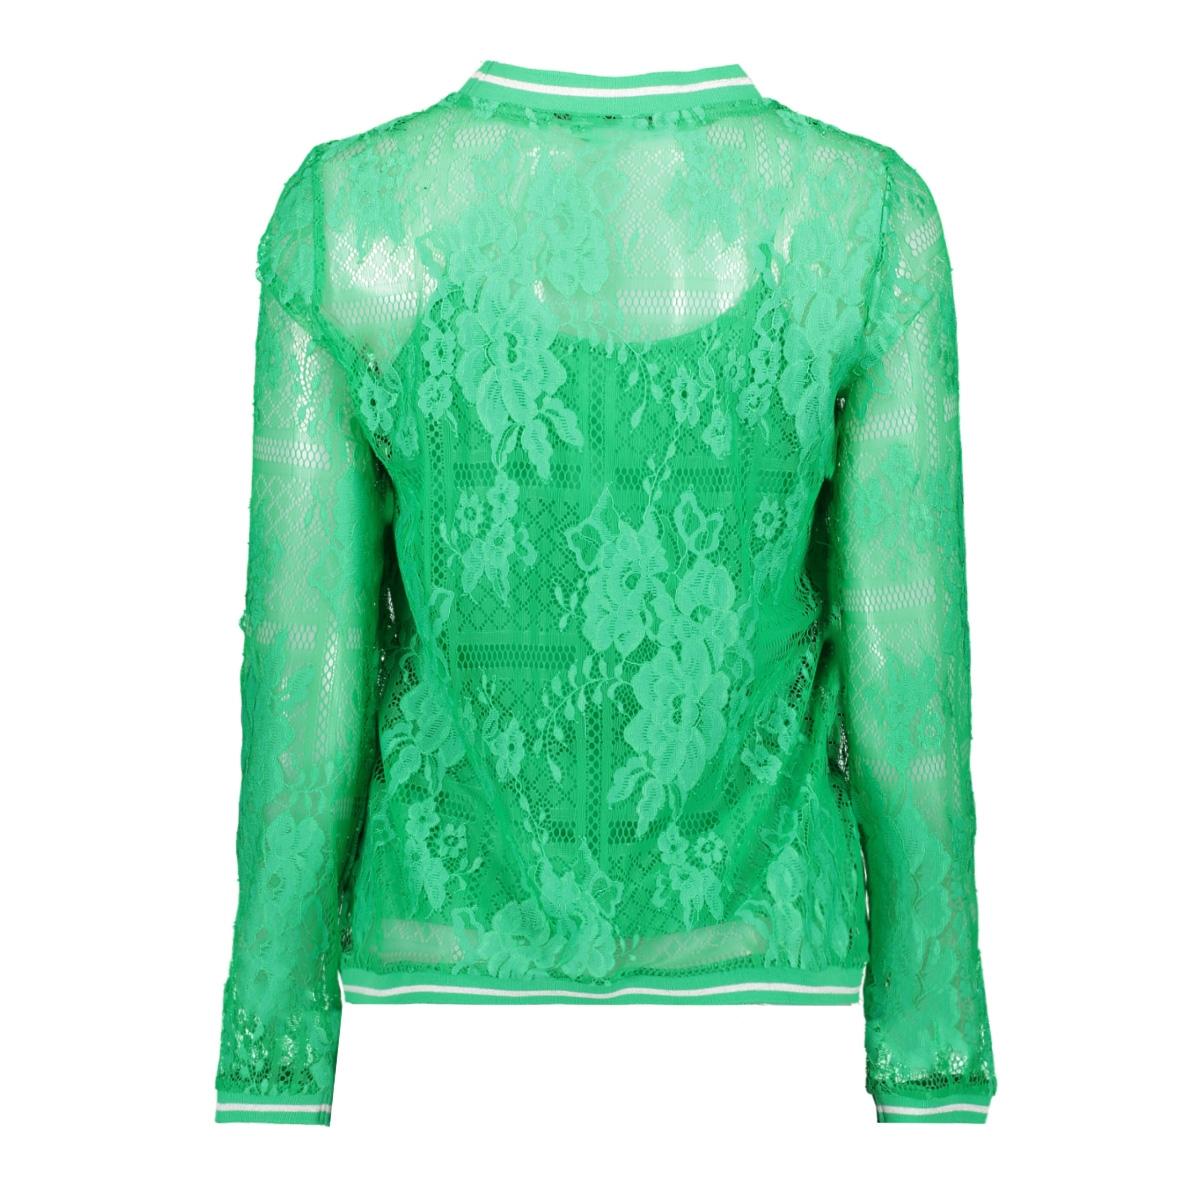 vmbine l/s midi top jrs 10211738 vero moda t-shirt holly green